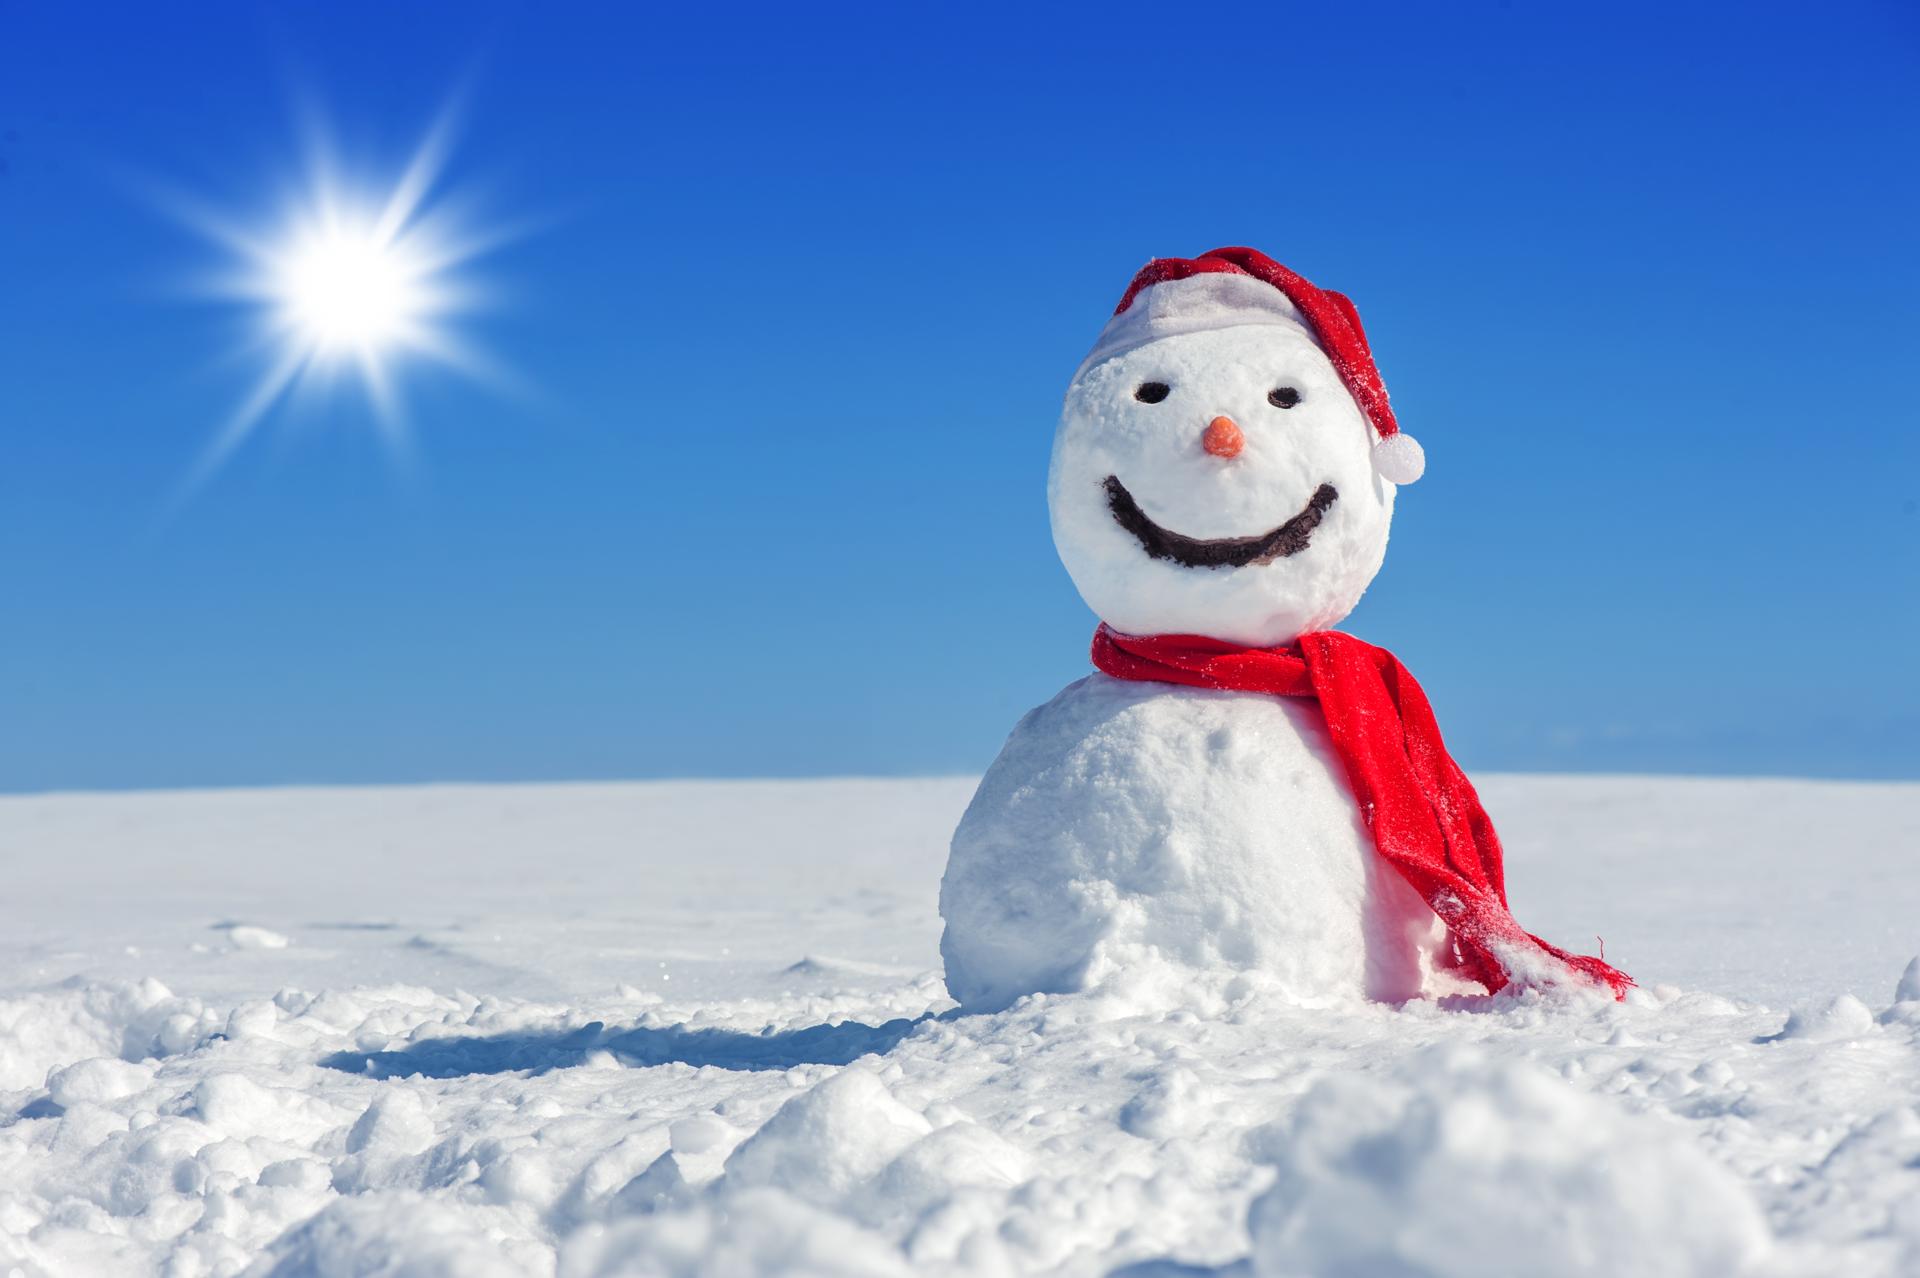 snowman_1920_2